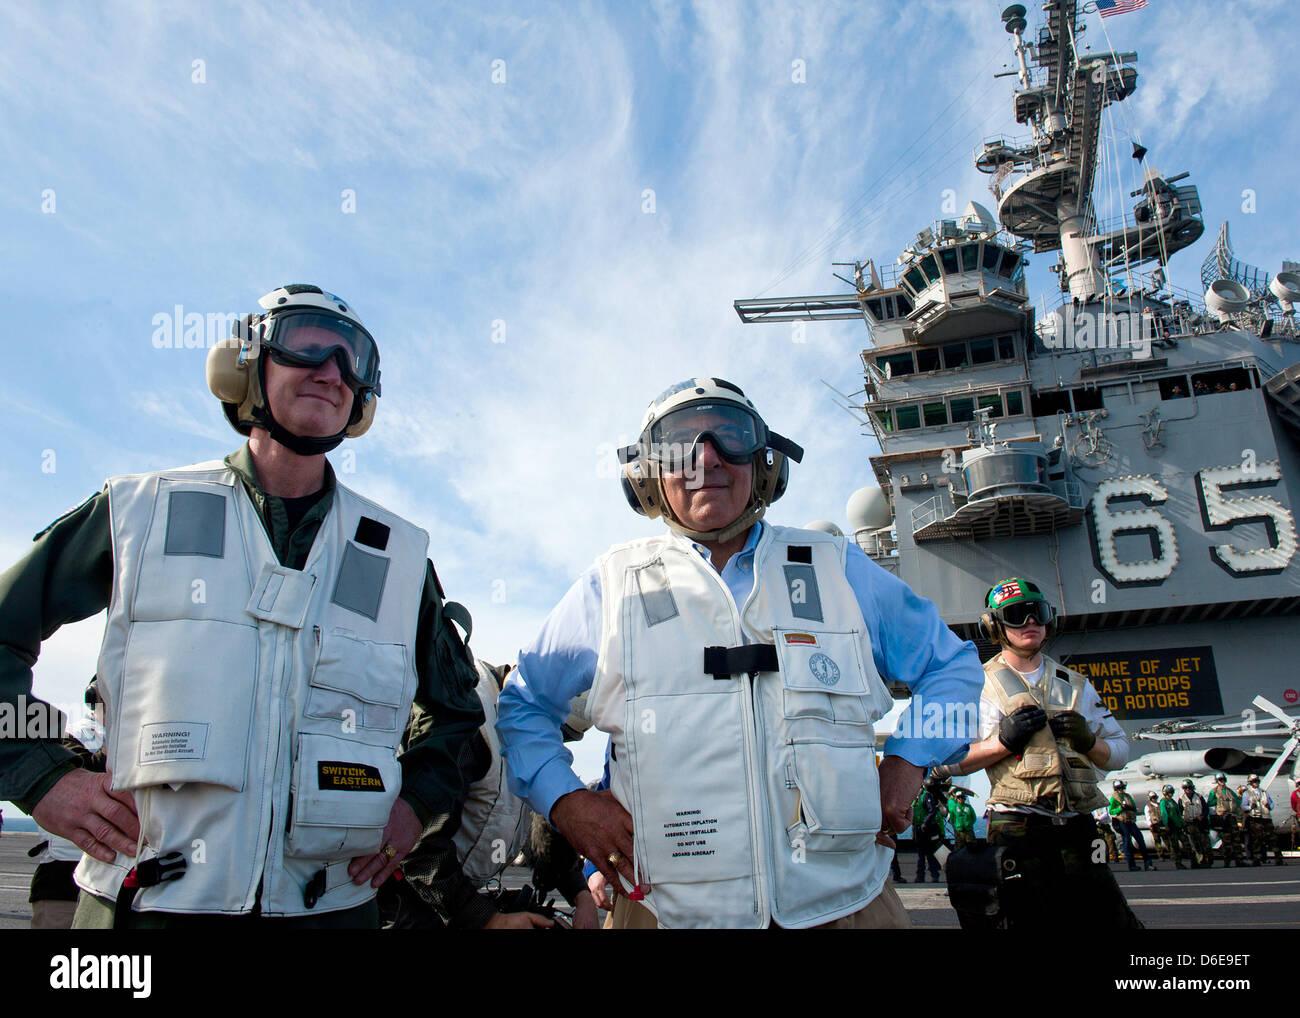 United States Secretary of Defense Leon E. Panetta, right, and Rear Admiral Walter E. Carter, commander of Carrier Stock Photo